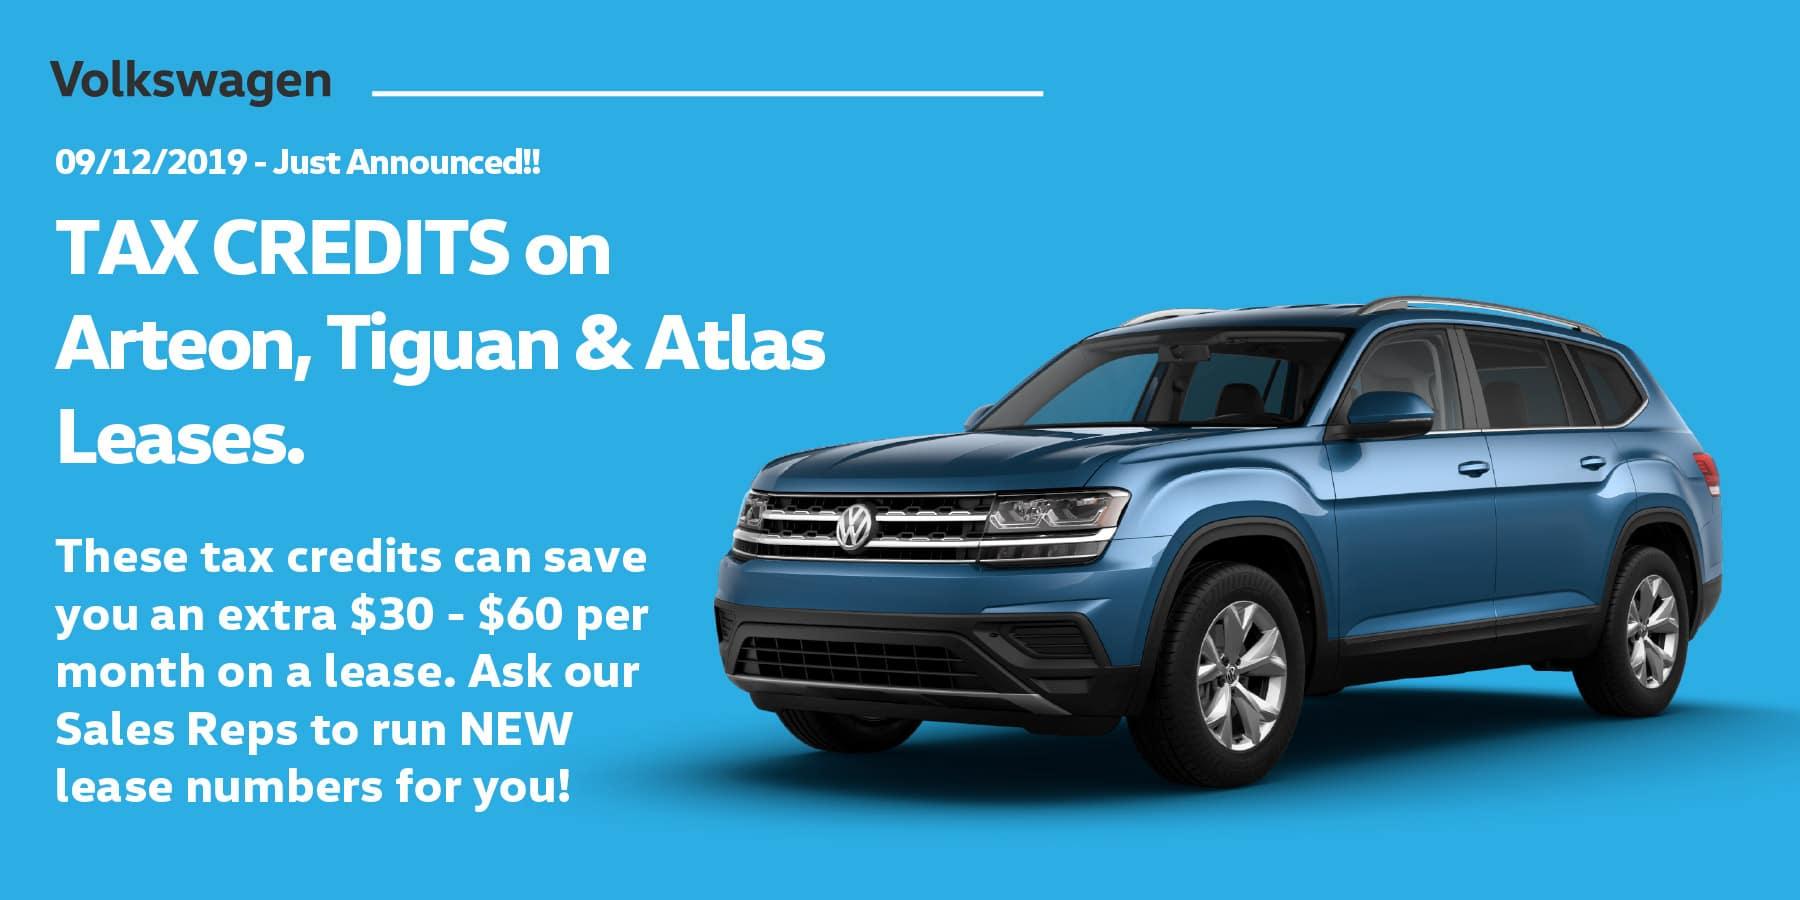 Autobahn Volkswagen | Arteon, Atlas & Tiguan Tax Credits Announced!